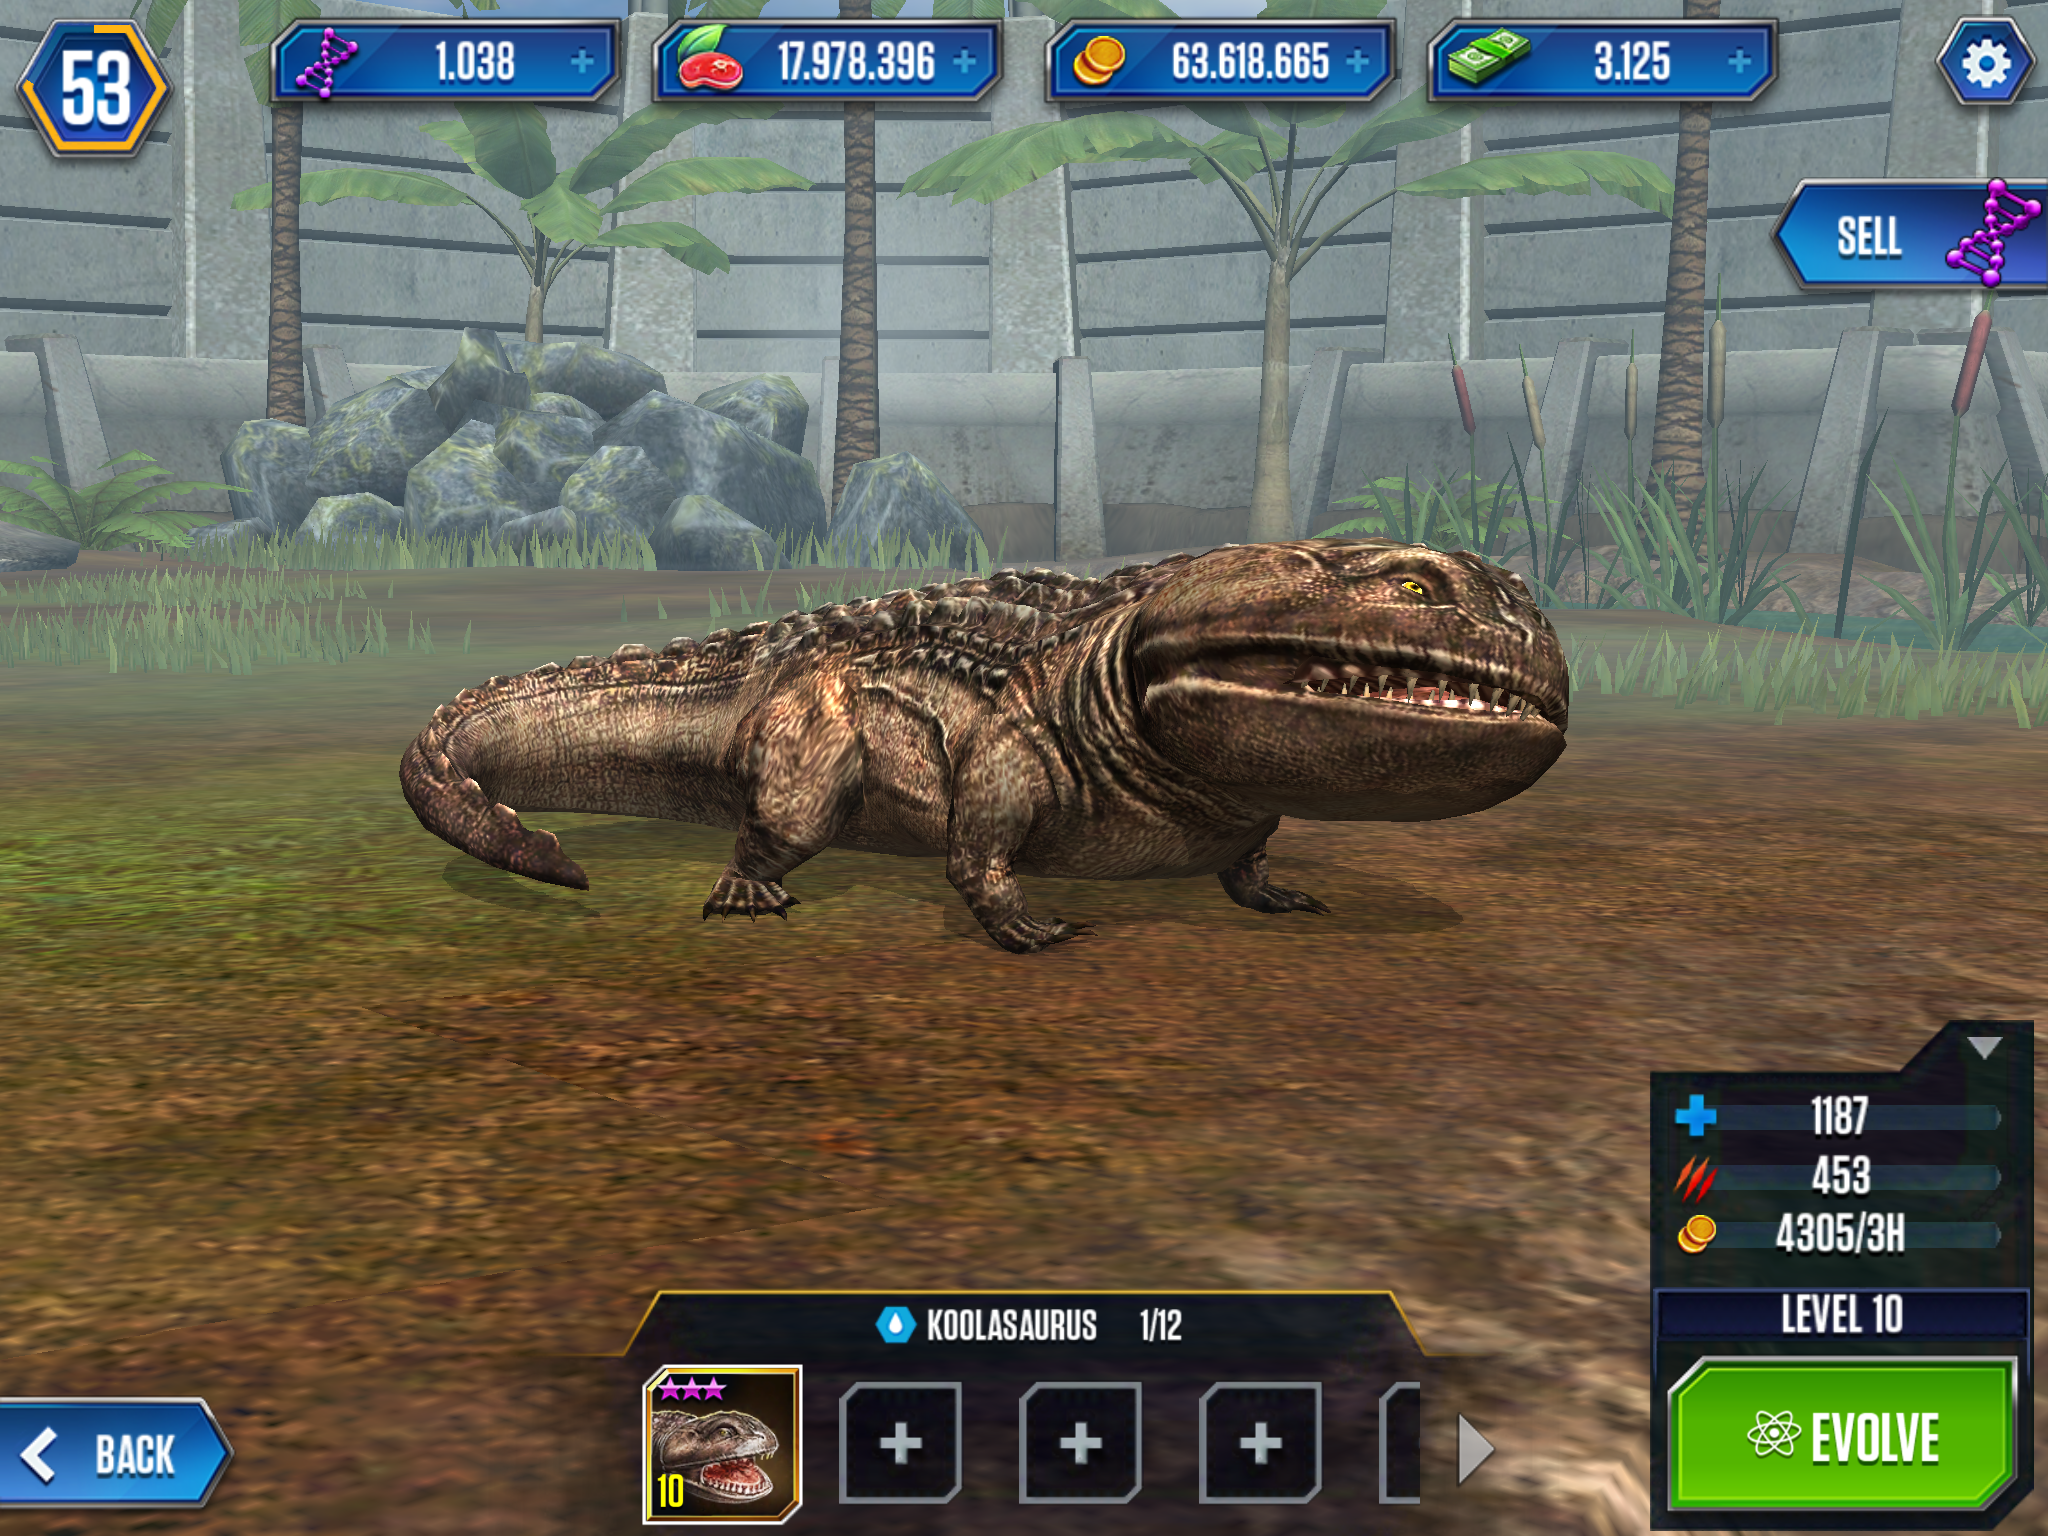 Koolasaurus, a hybrid of Koolasuchus and Sarcosuchus from